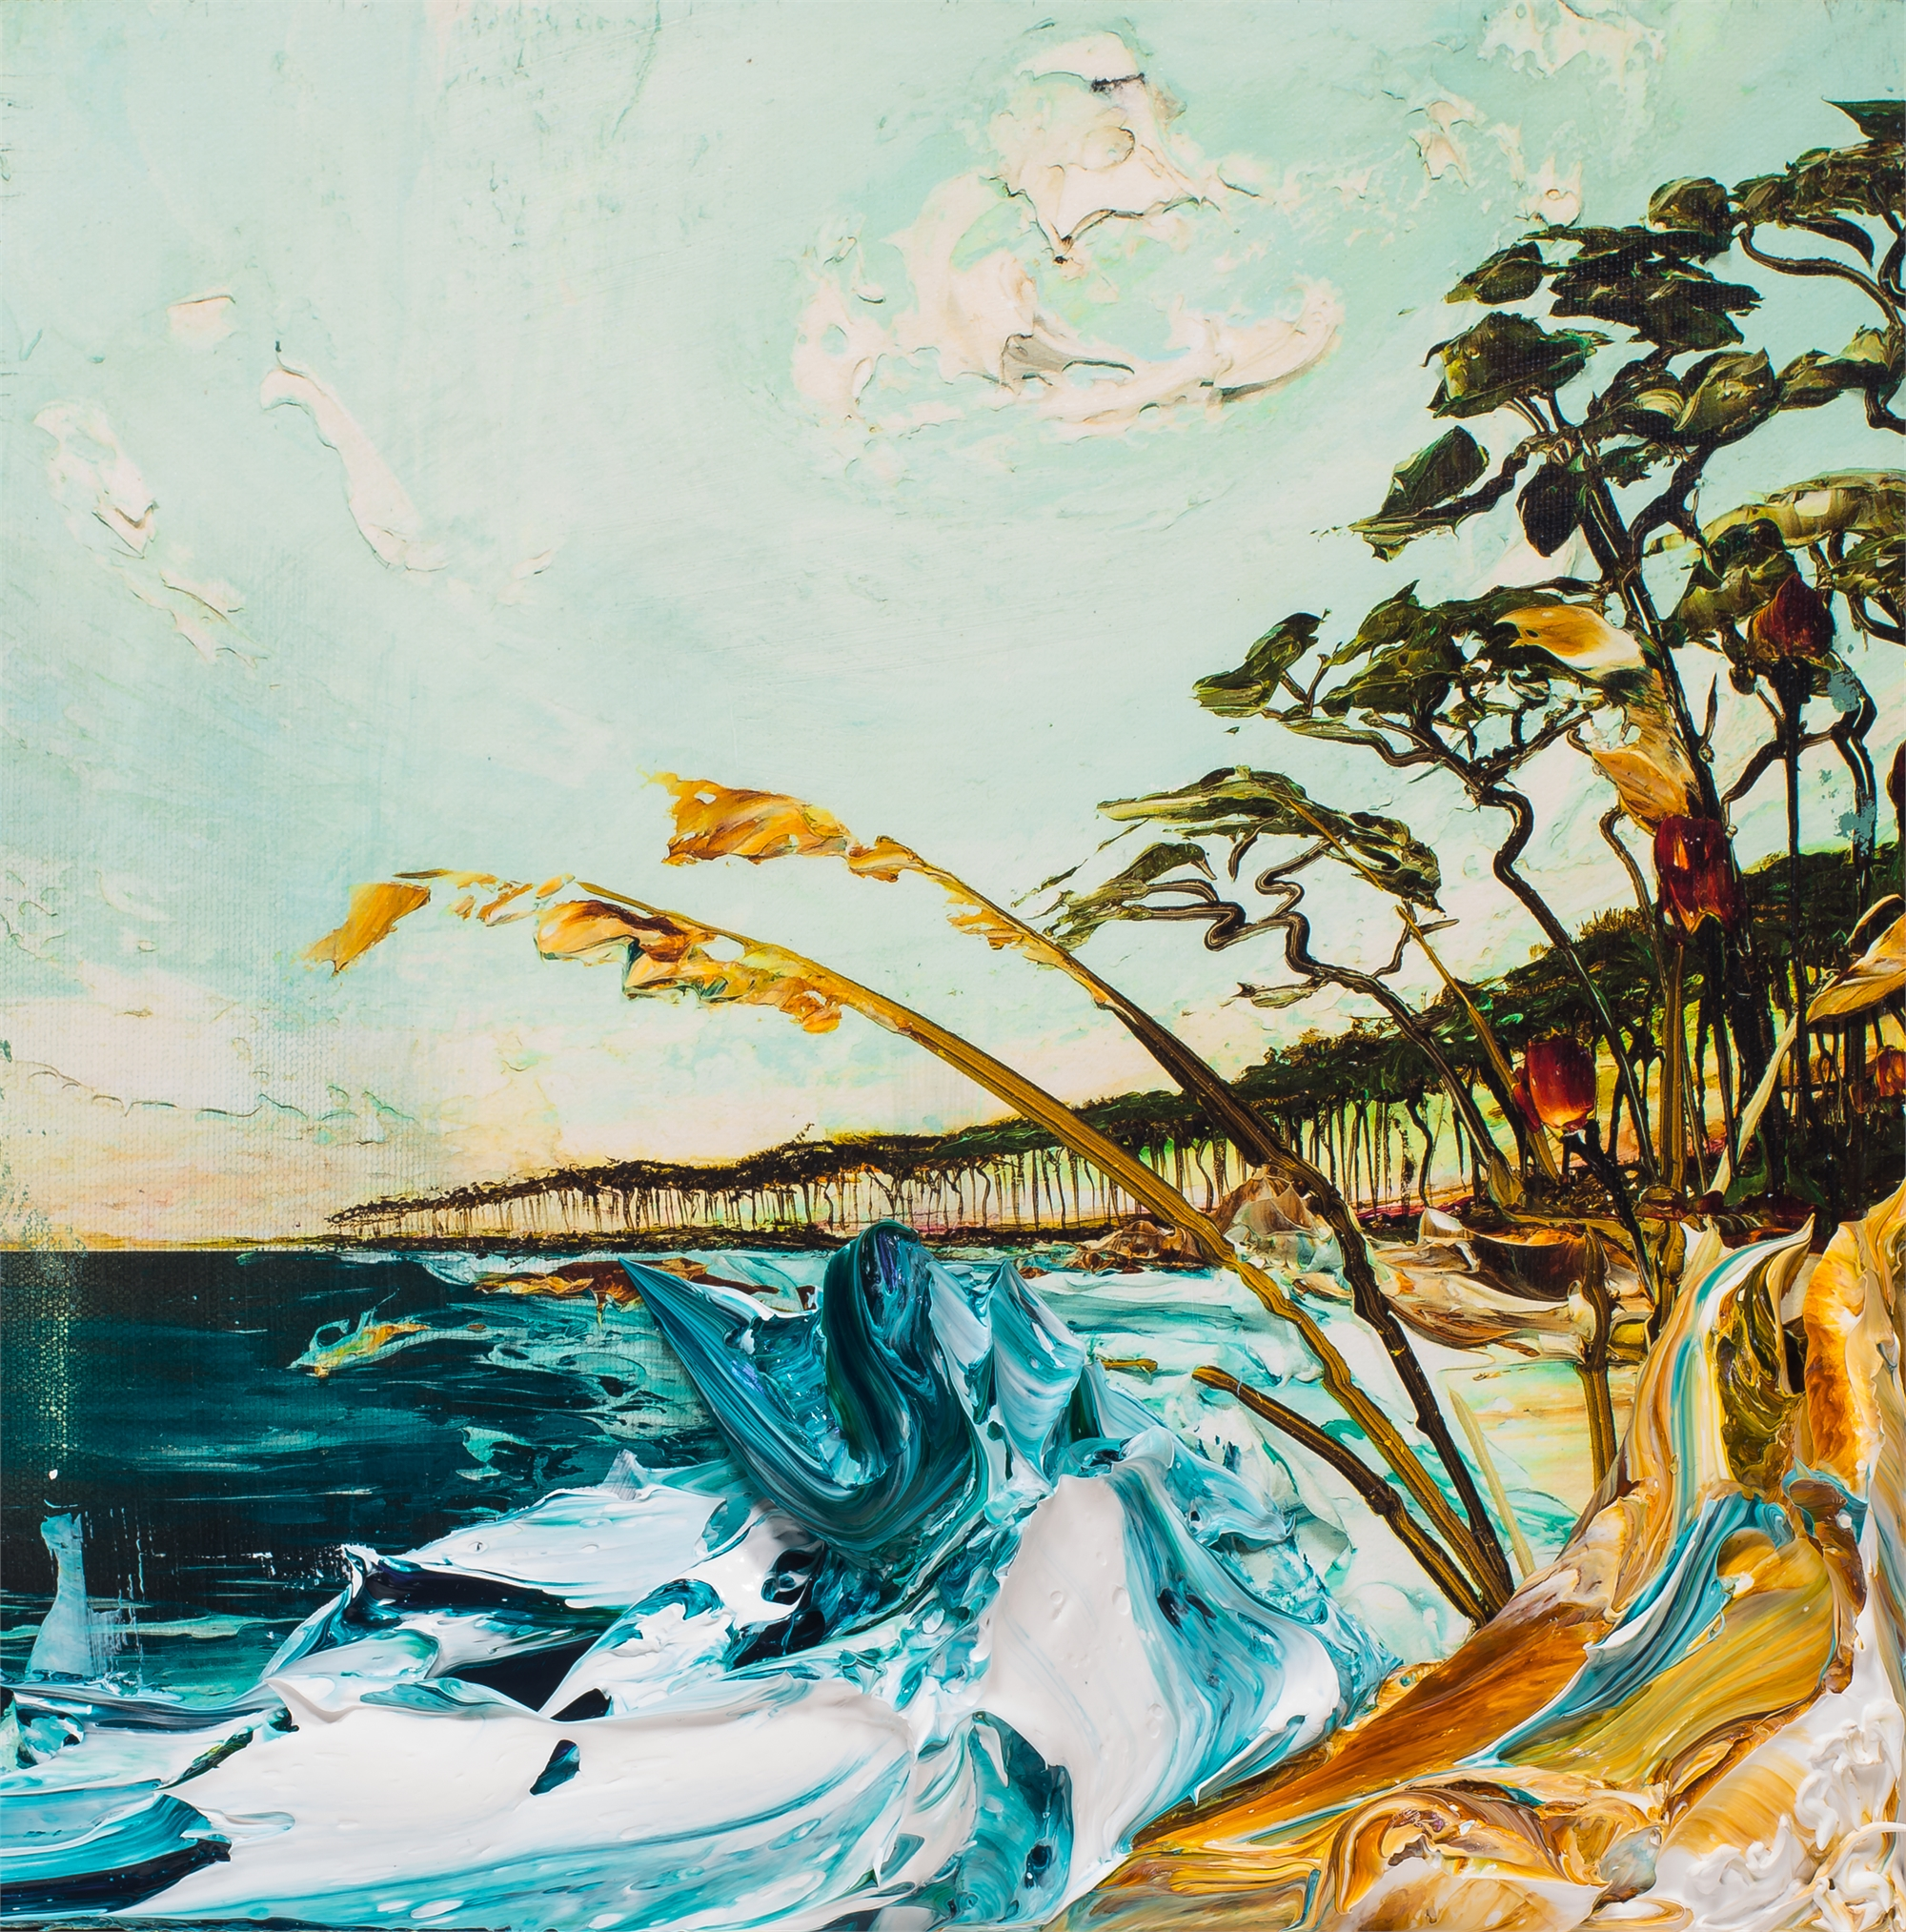 SEASCAPE HPAE 30/50 by Justin Gaffrey